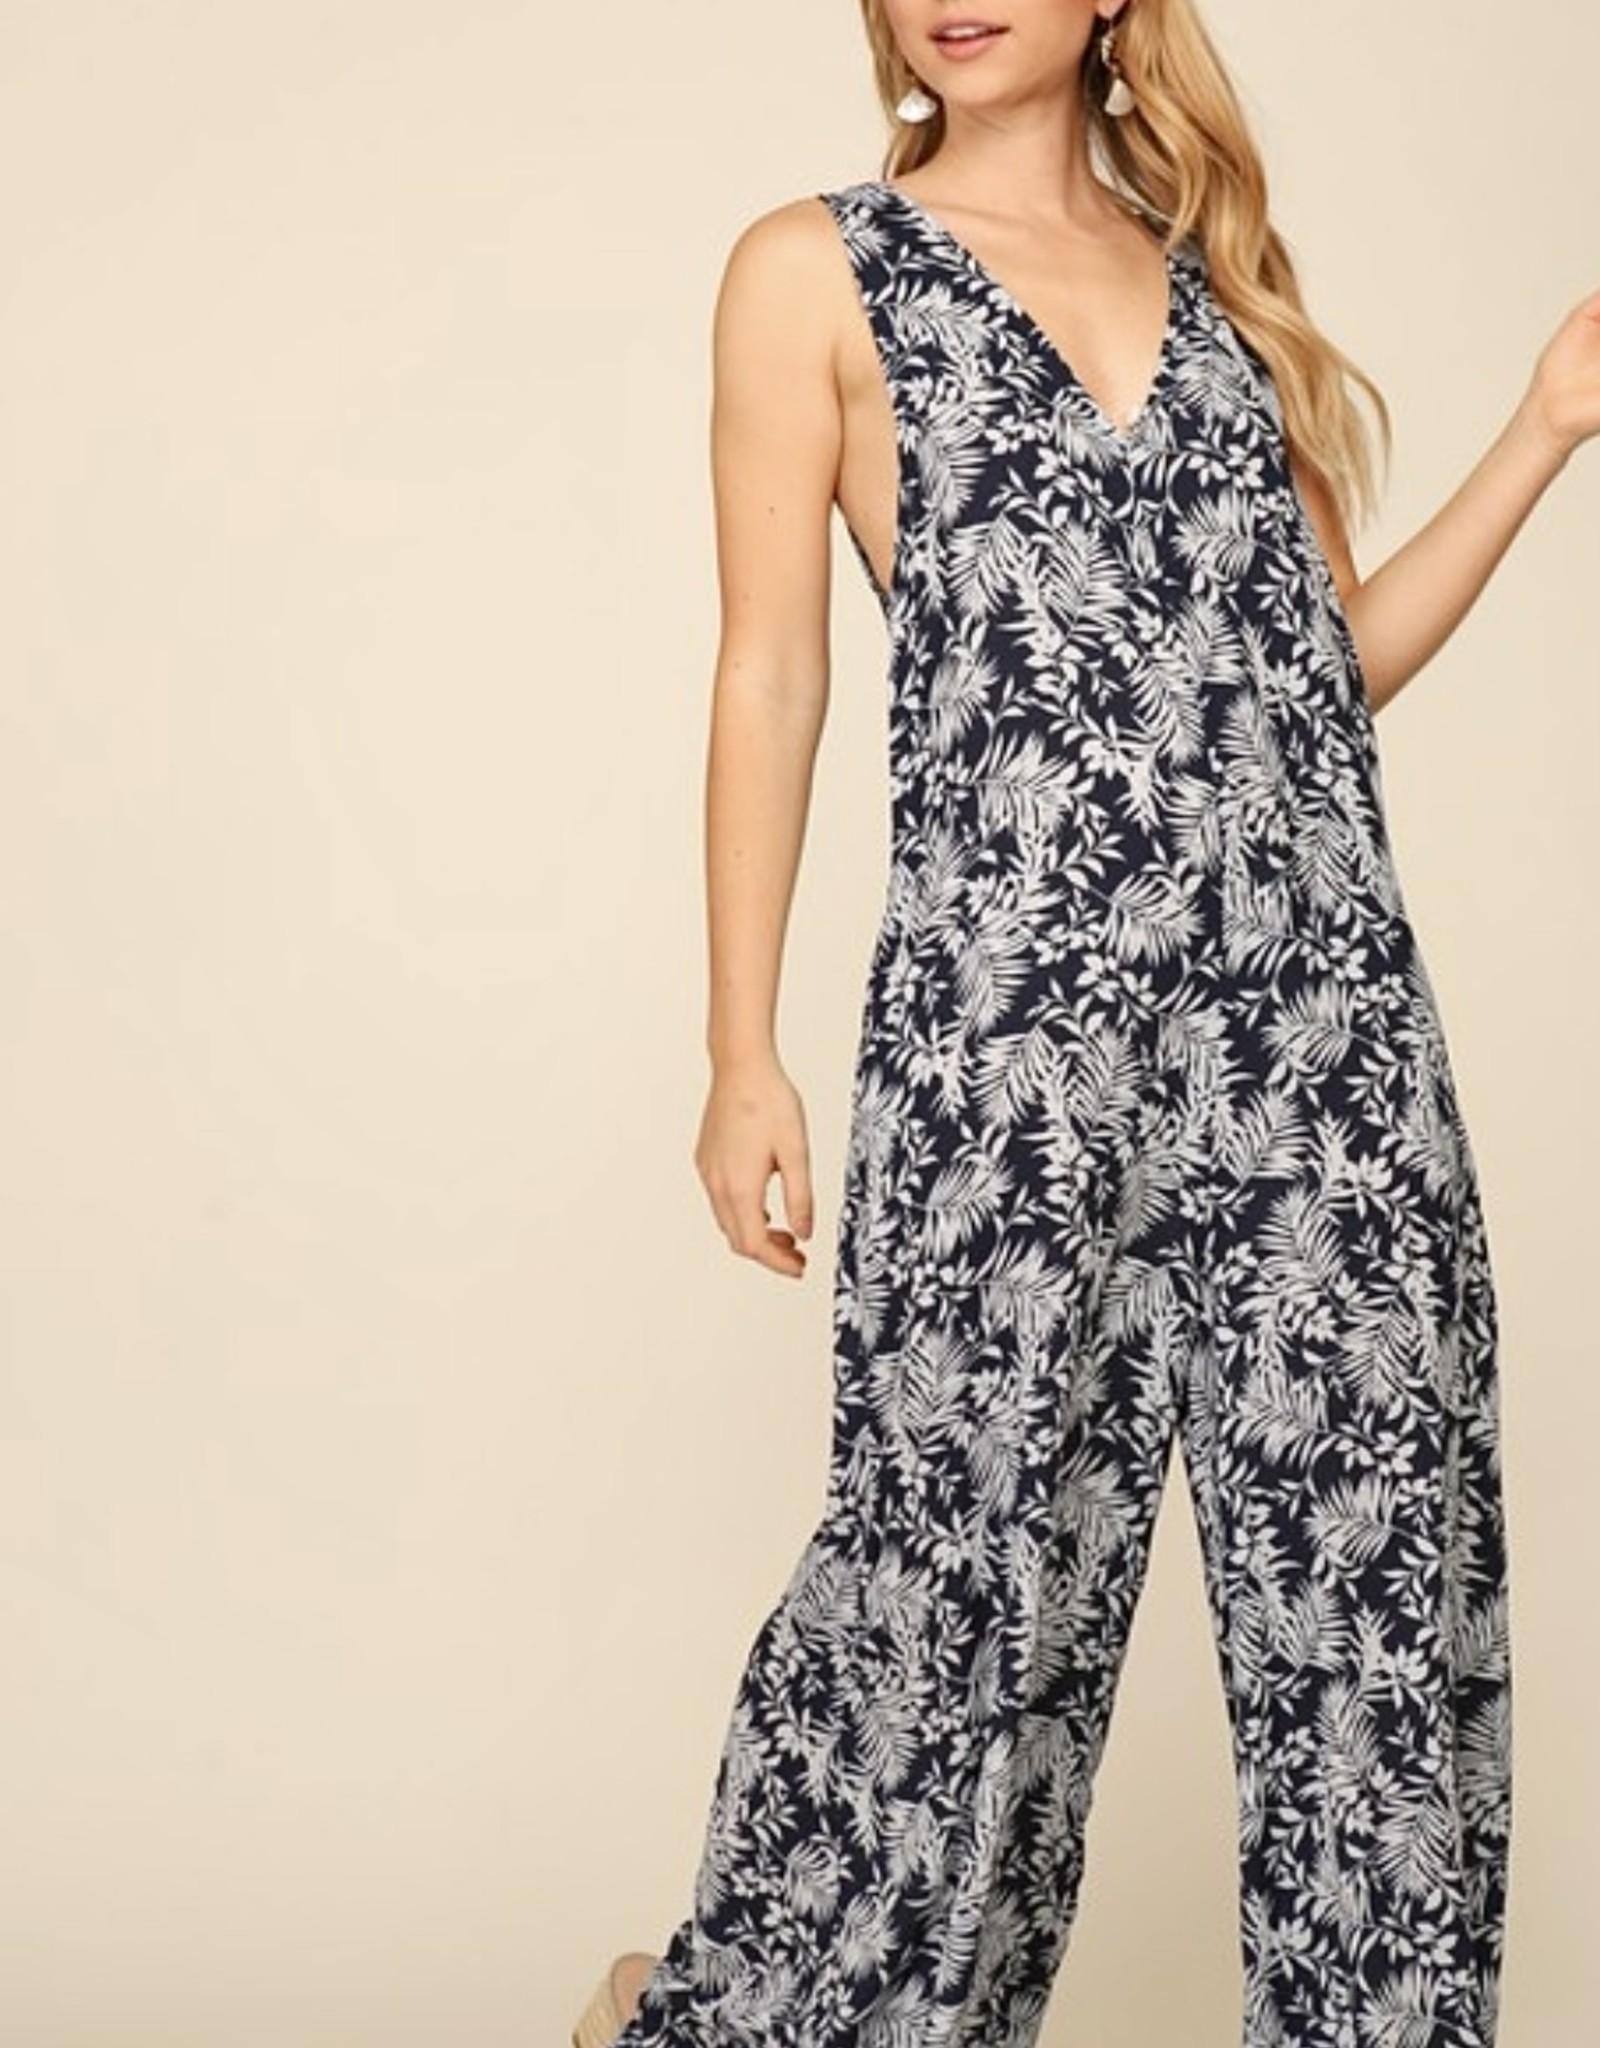 HUSH Tropical print loose fitting jumpsuit